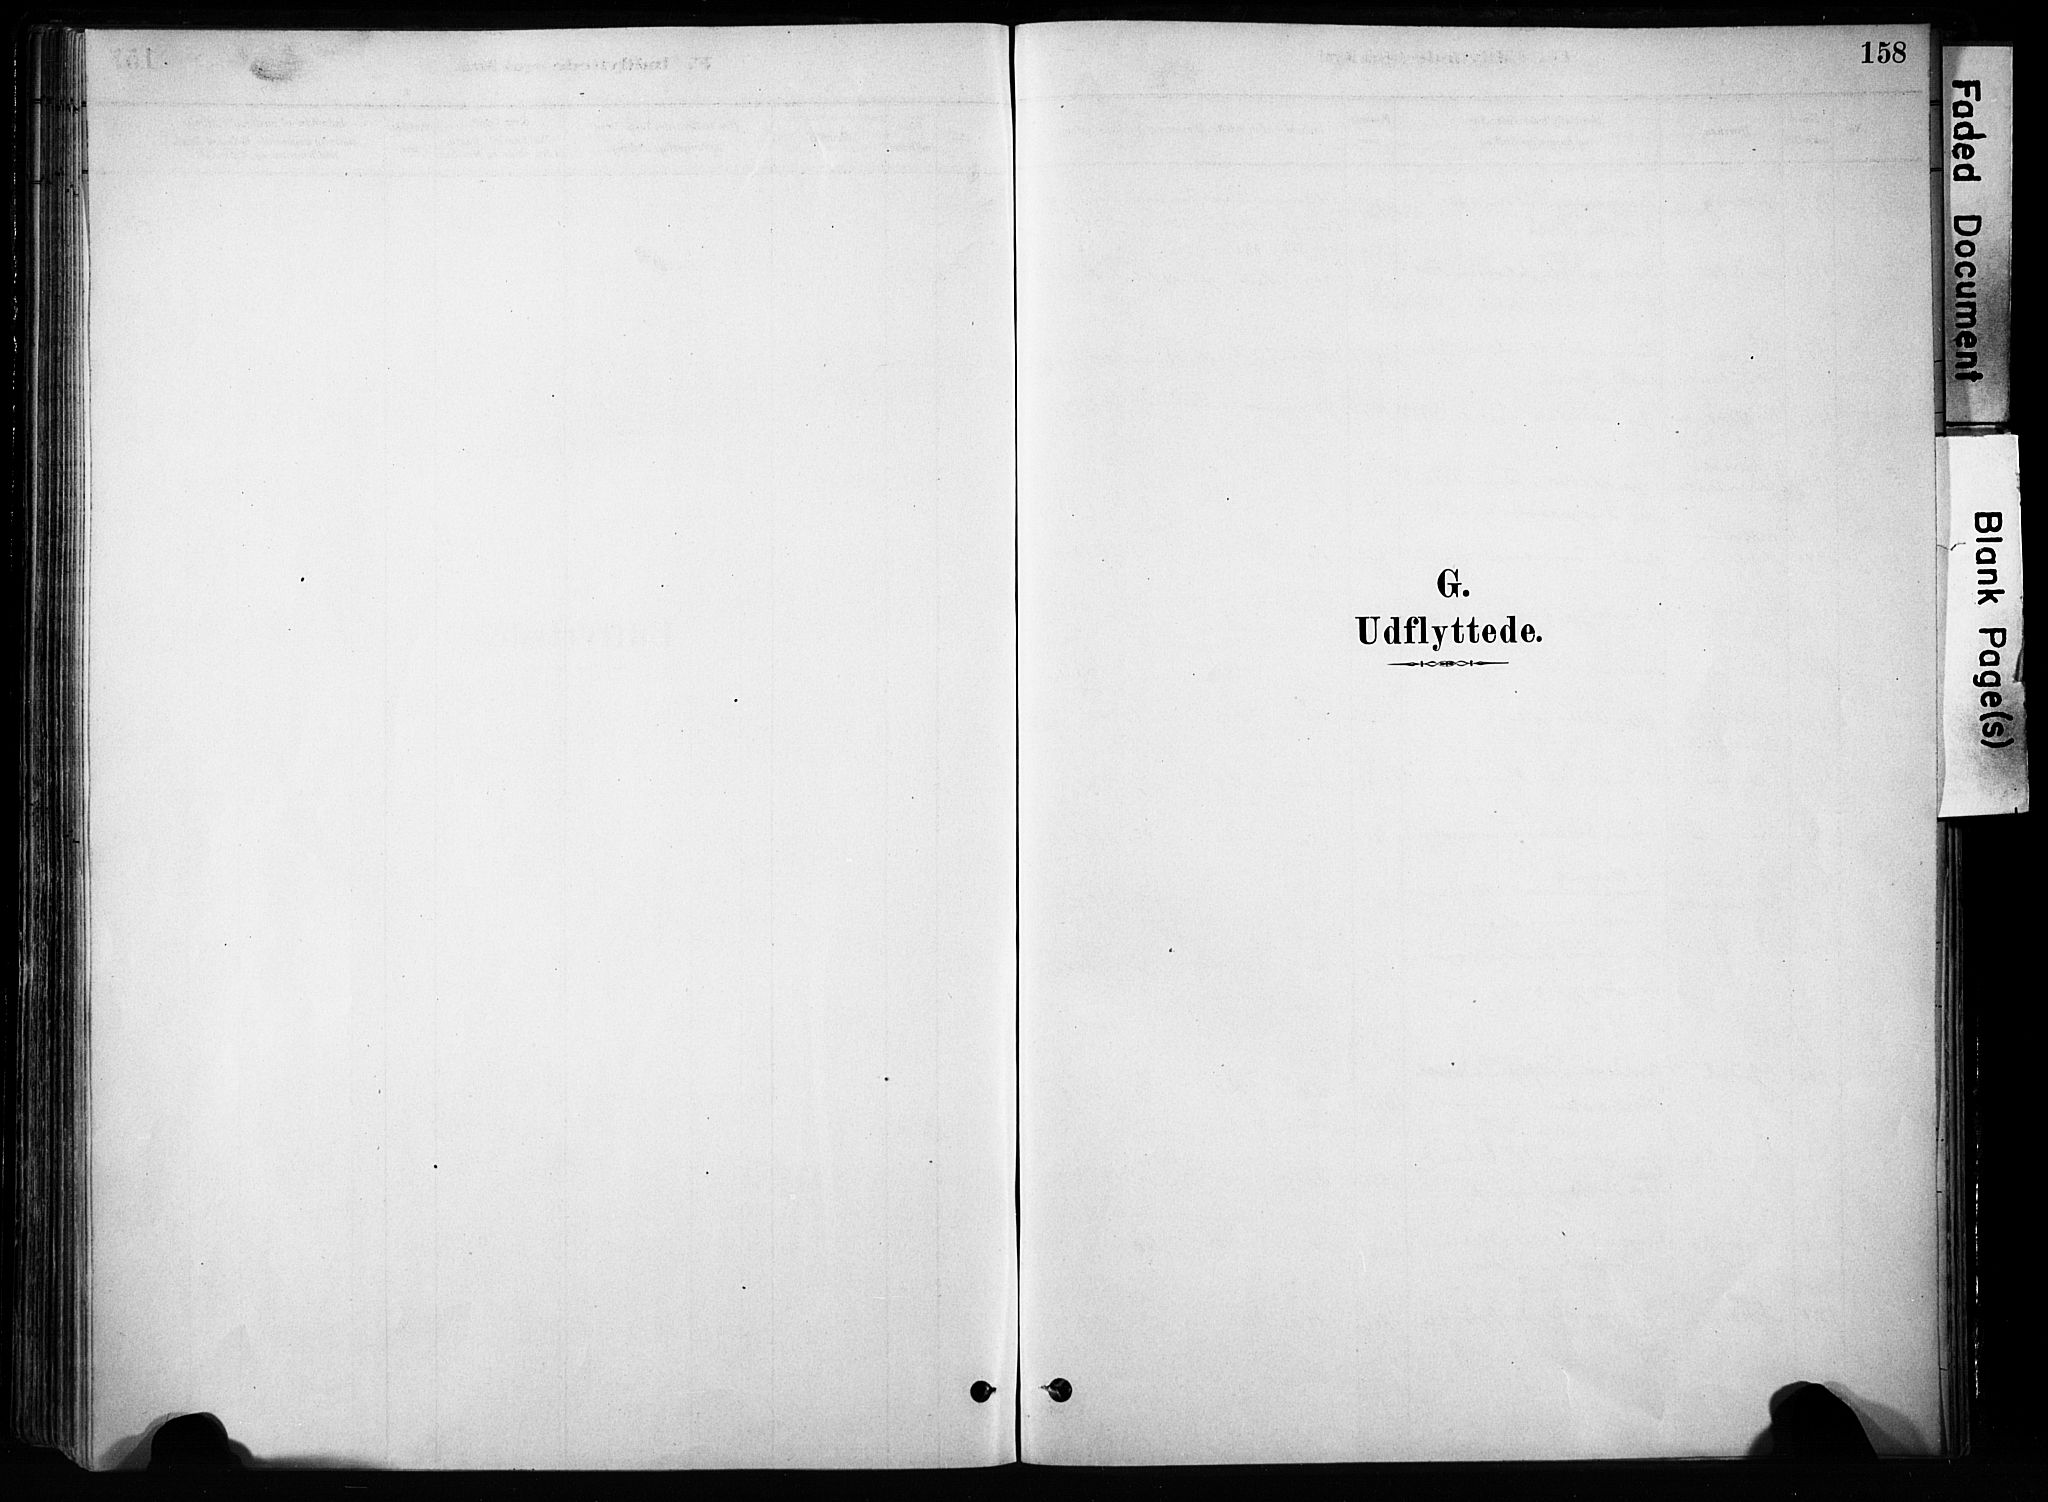 SAH, Skjåk prestekontor, Ministerialbok nr. 4, 1880-1904, s. 158